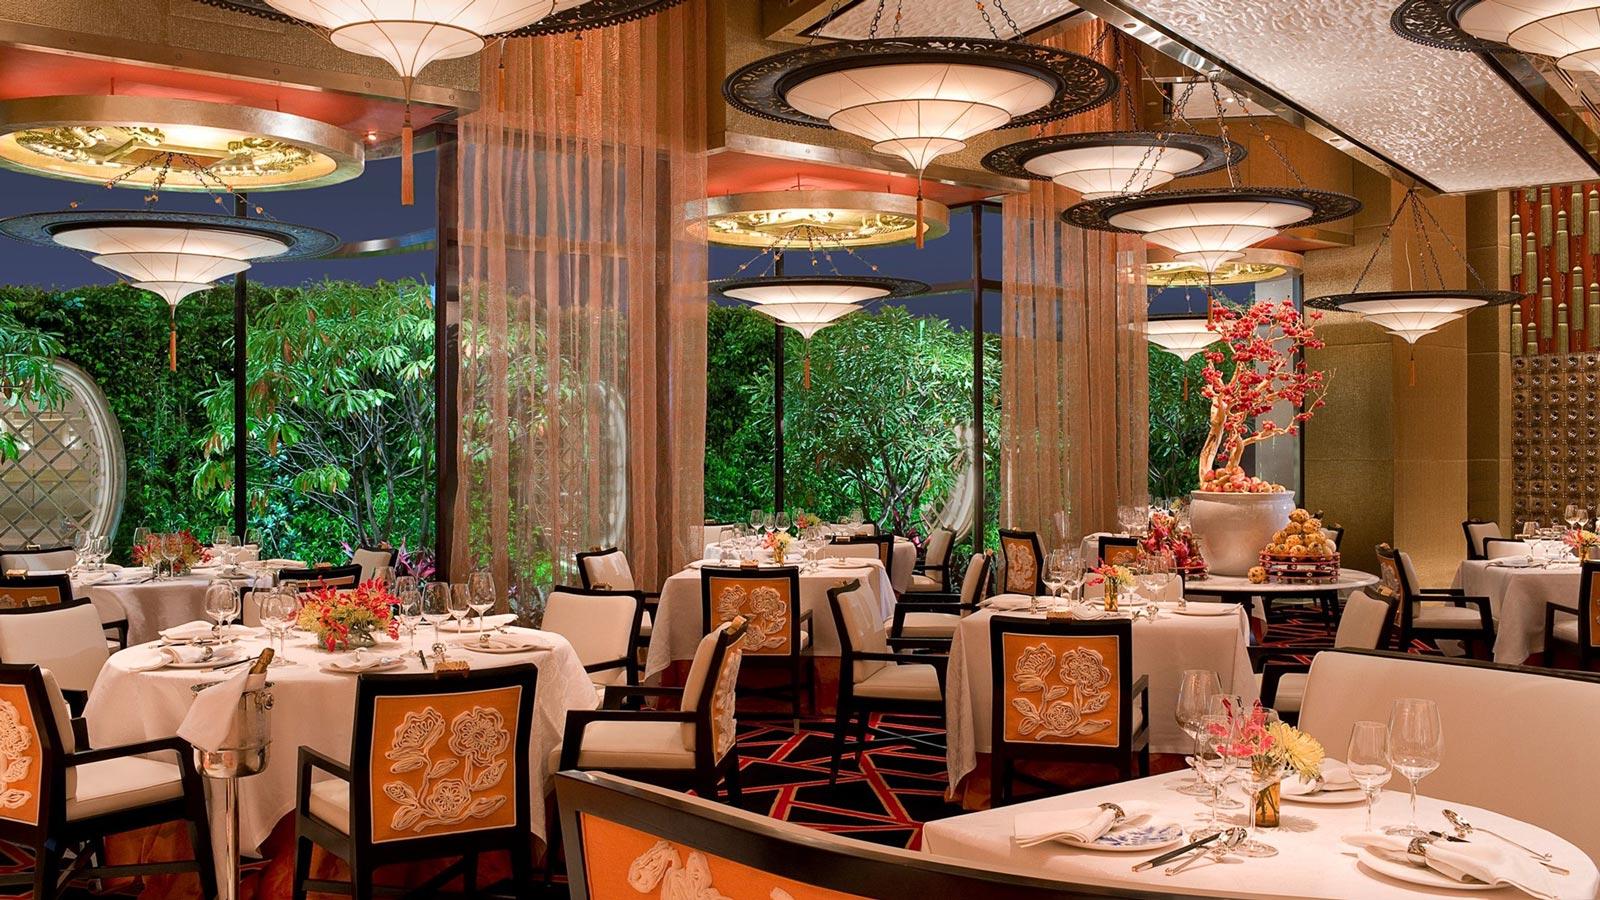 GOLDEN FLOWER Restaurant en China con lámparas Fortuny